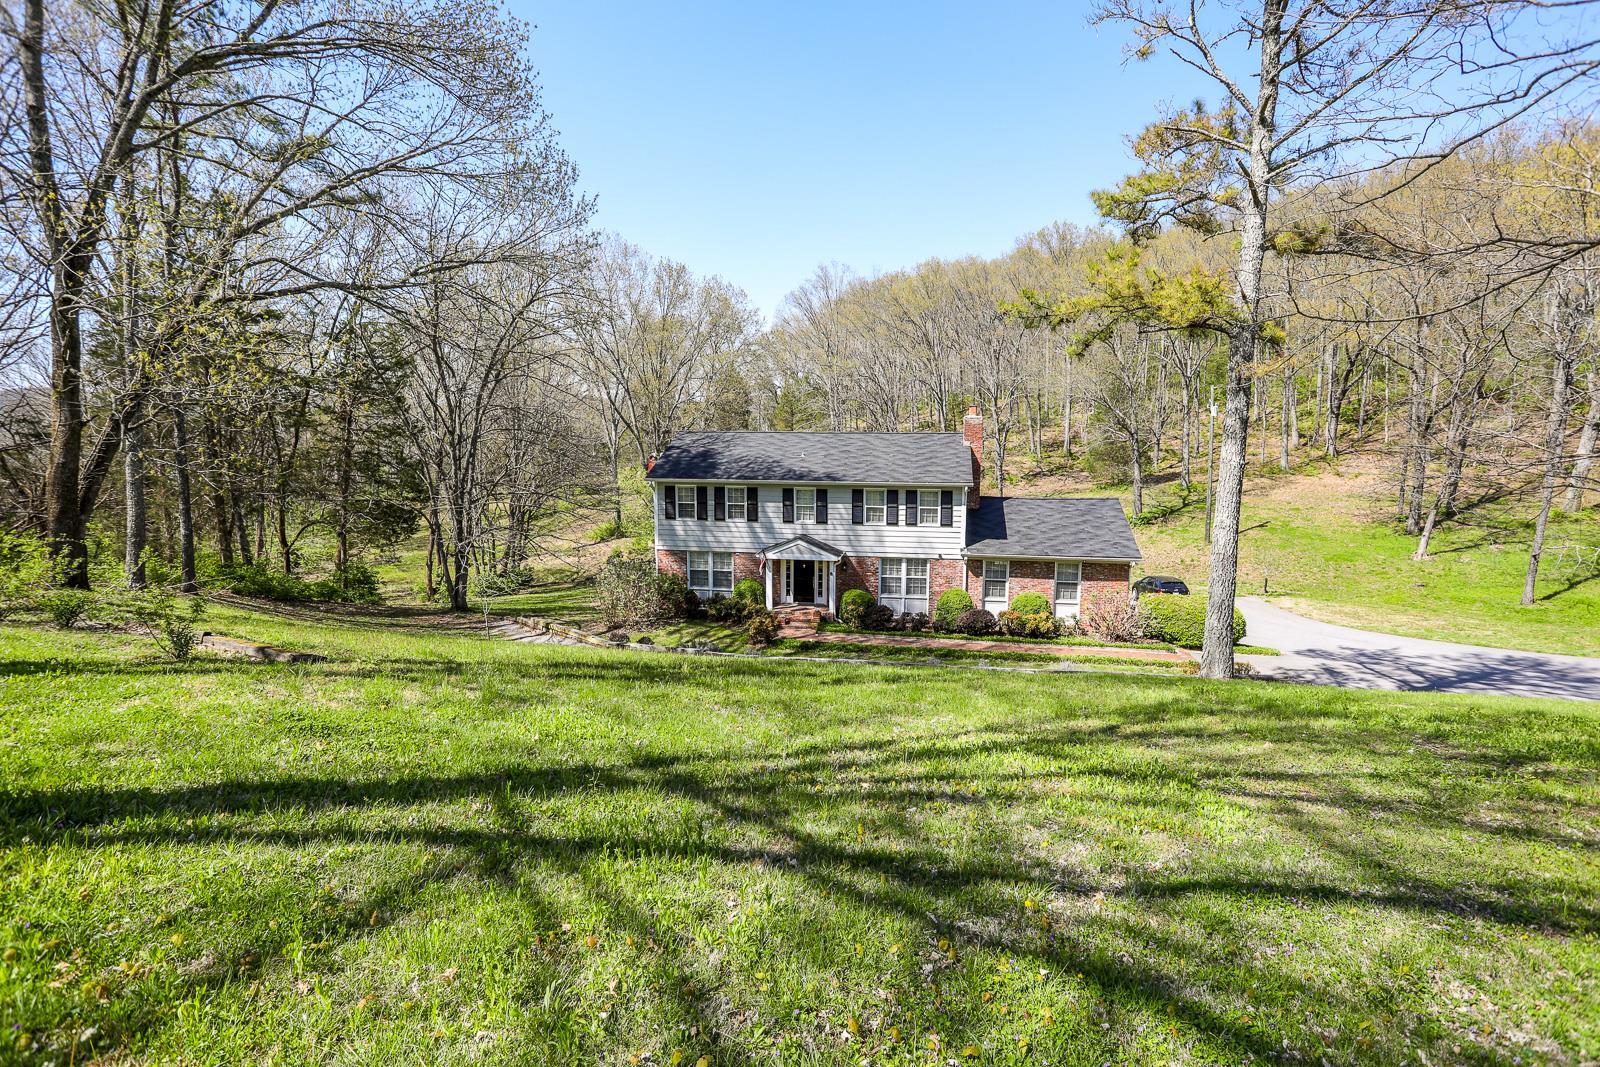 1833 Cromwell Dr, Nashville, TN 37215 - Nashville, TN real estate listing